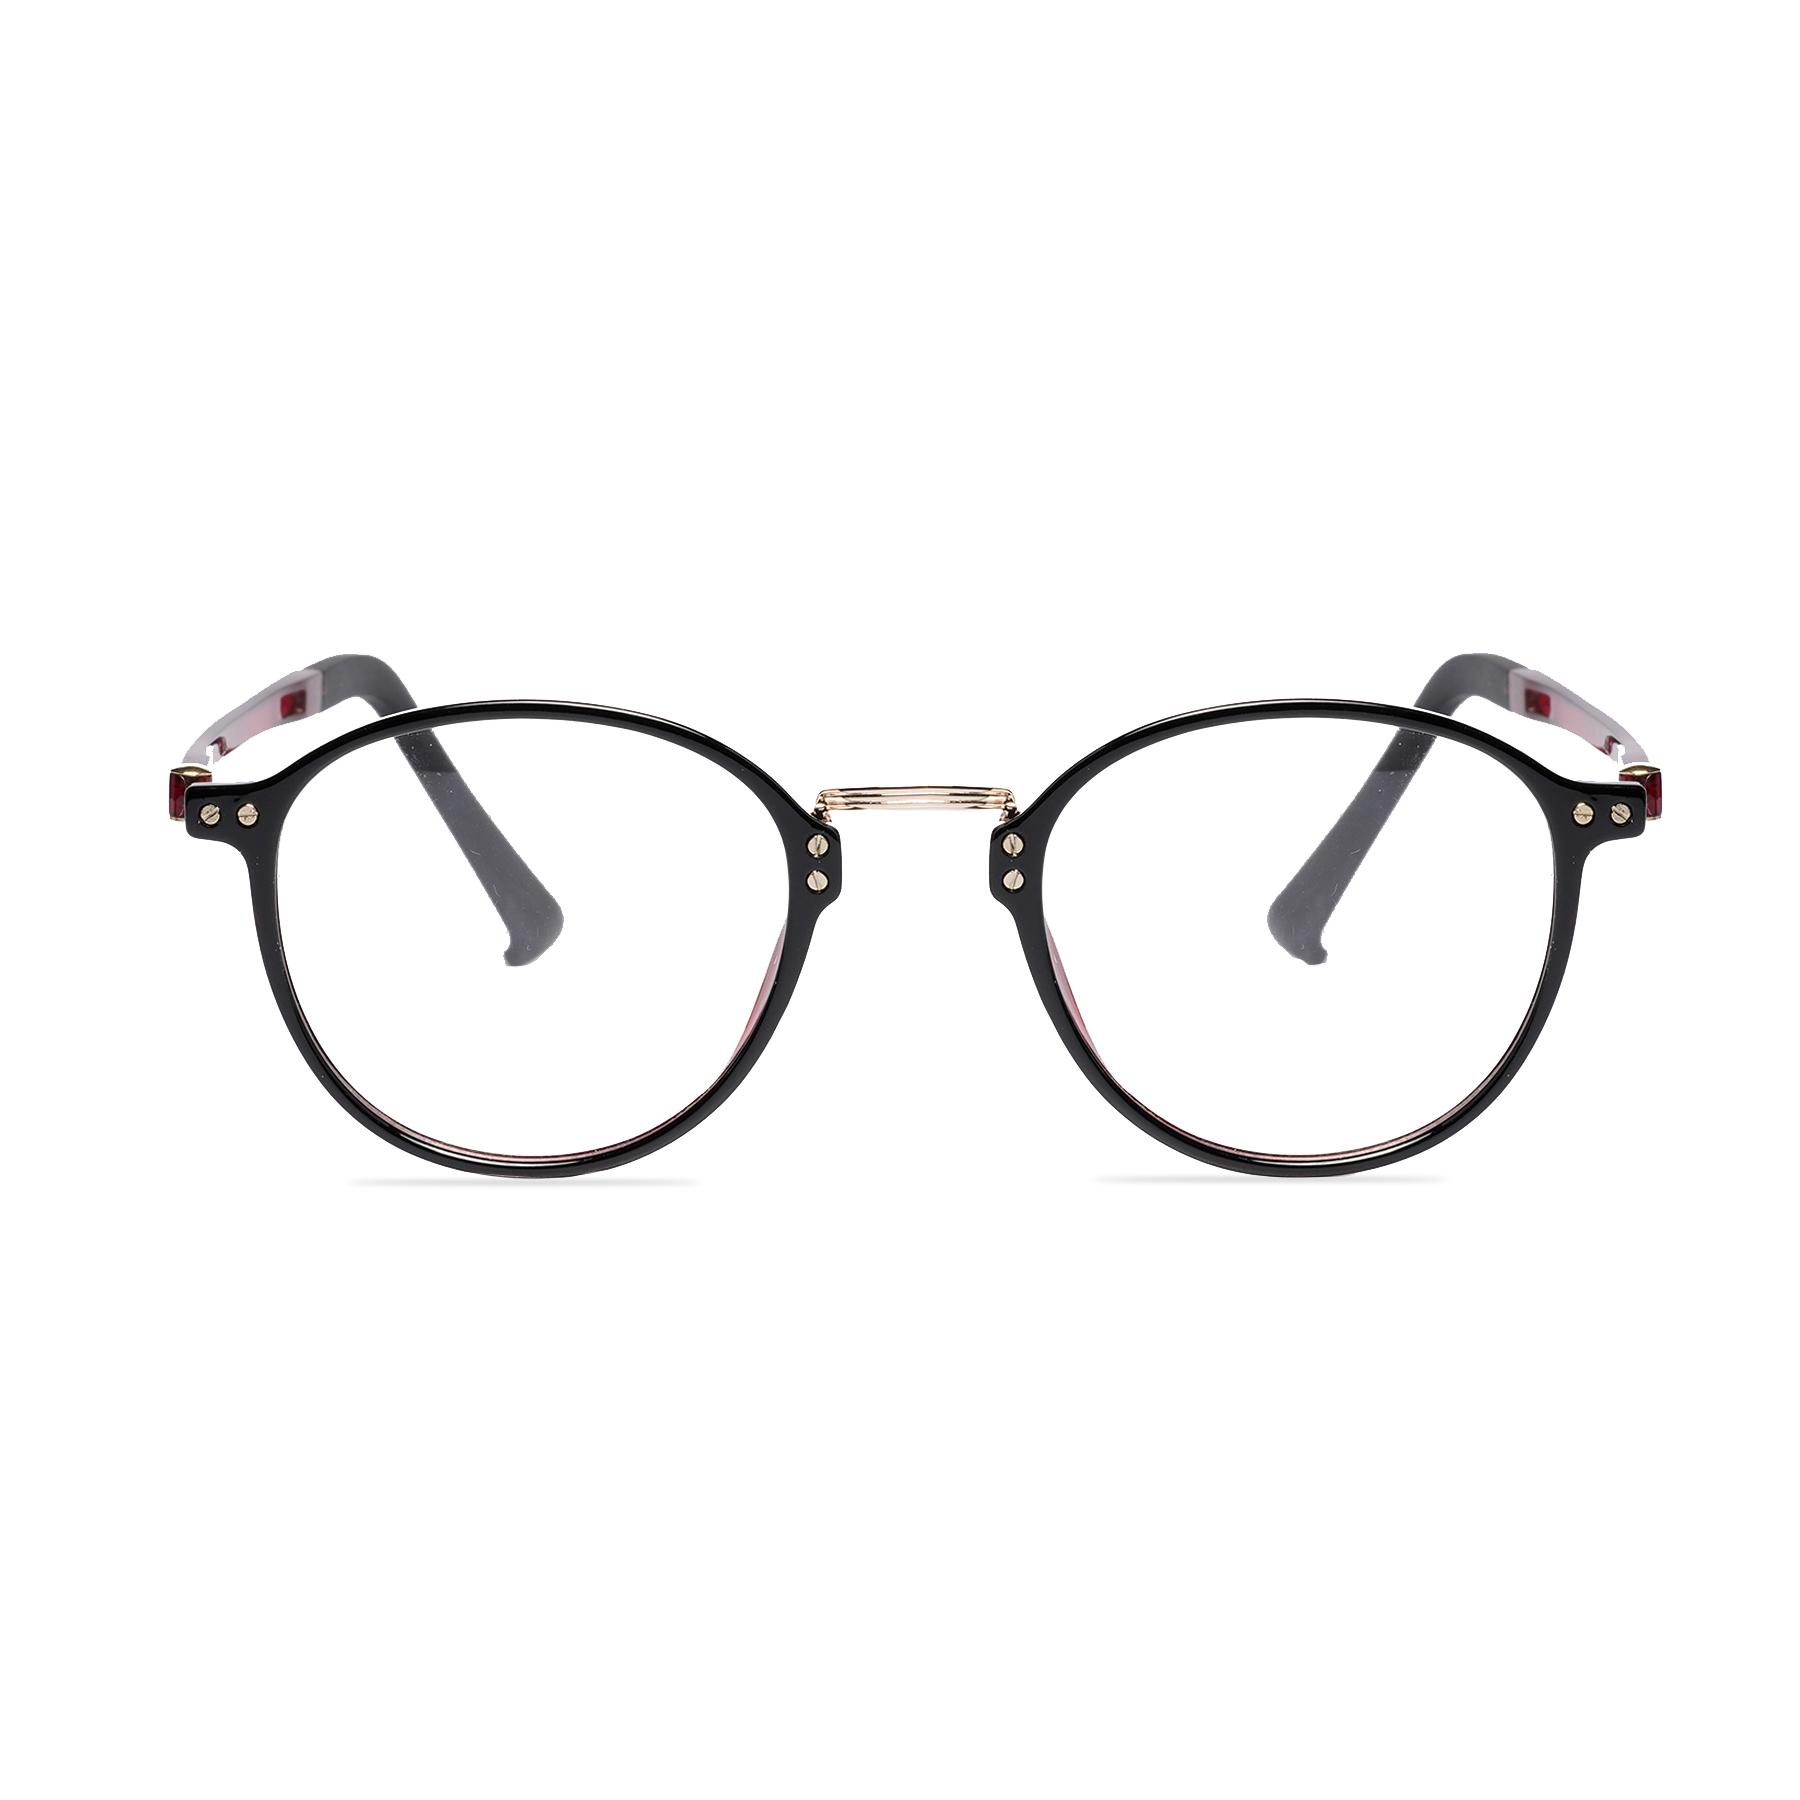 Vinaldi Plus VP011 Optical Frames